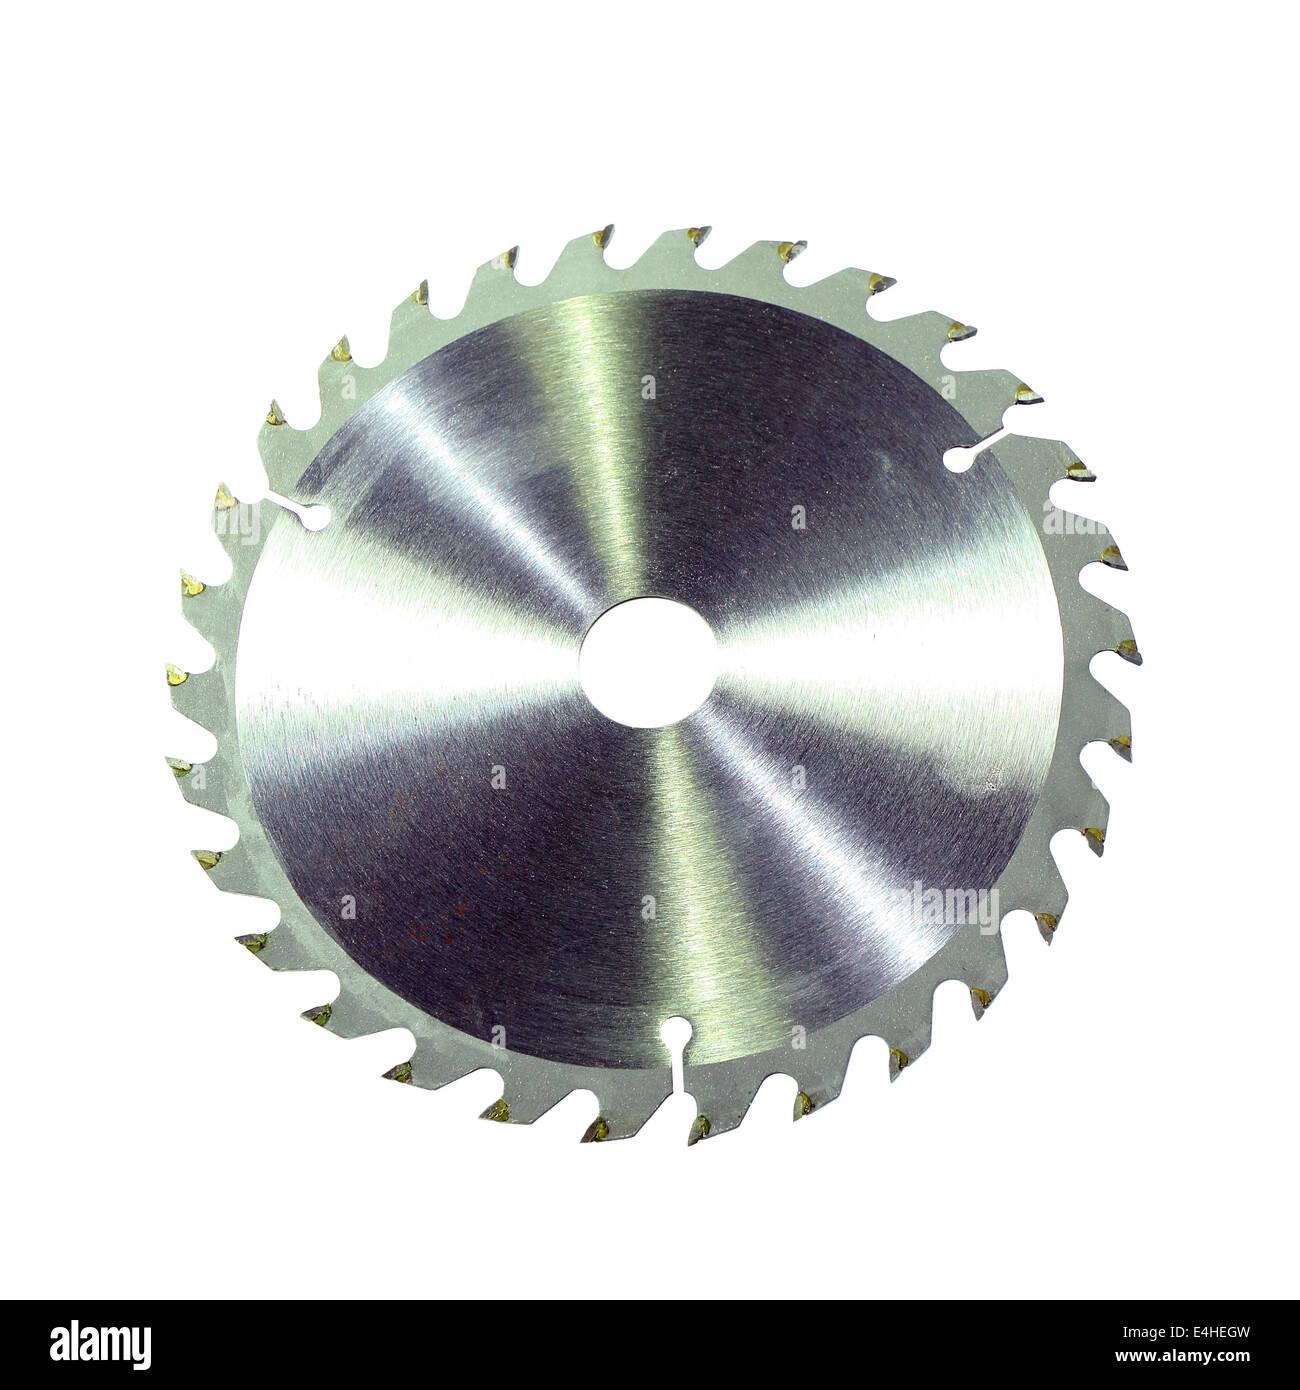 Circular saw blade - Stock Image